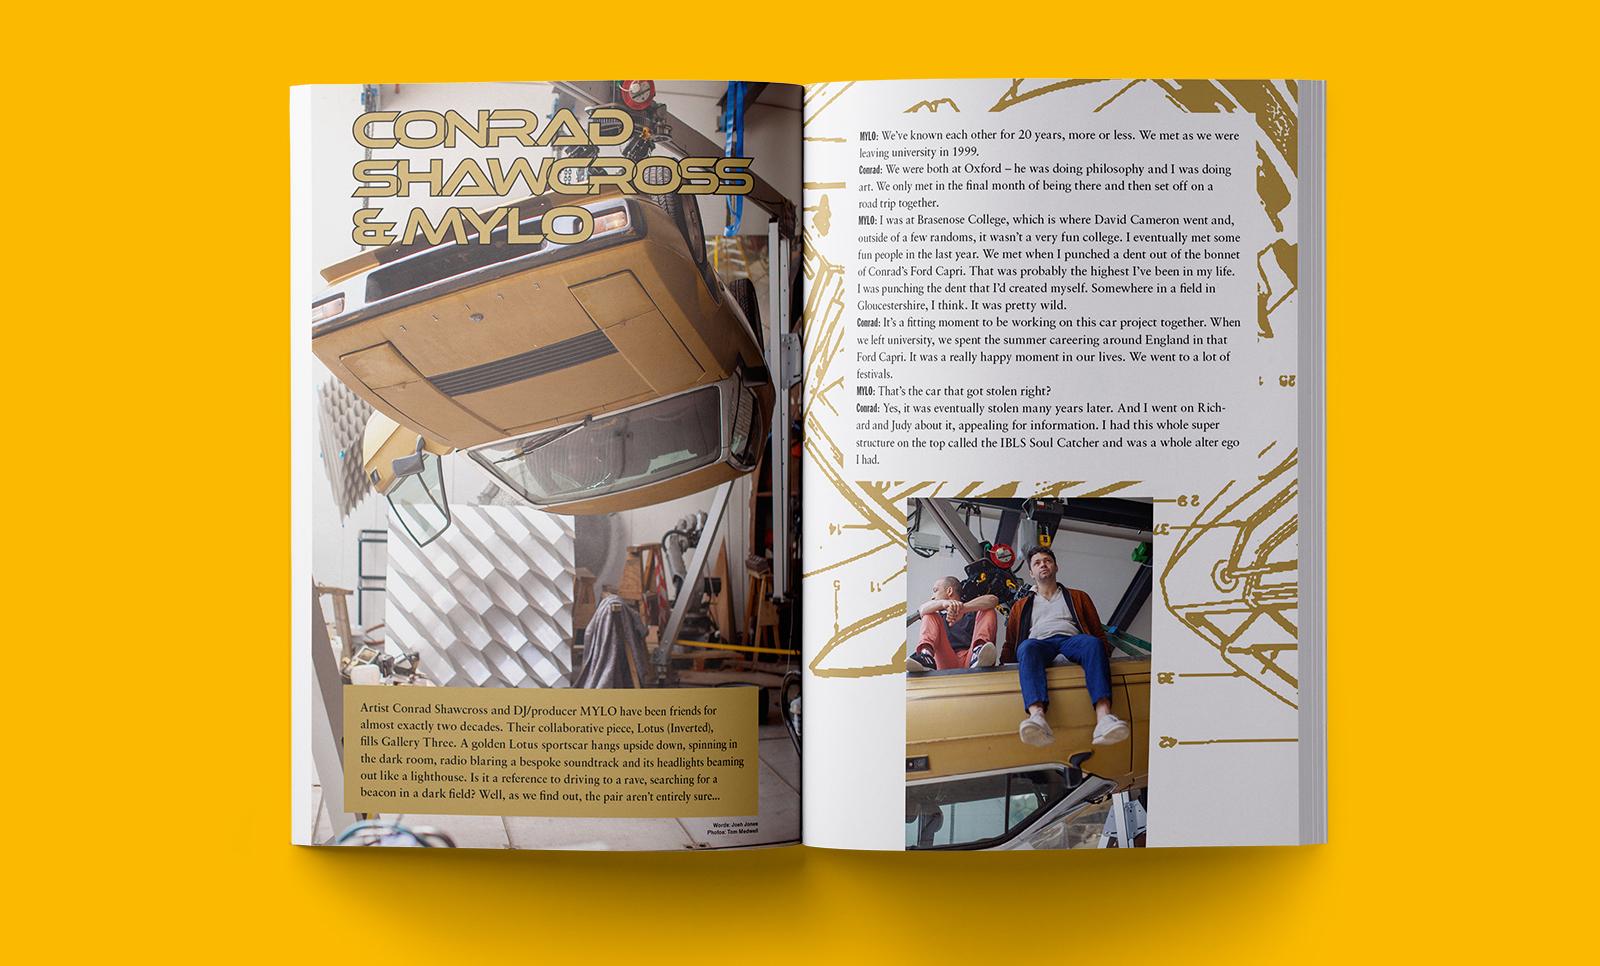 Sweet-Harmony-Saatchi-Gallery-Rave-Today-Book-Conrad-Shawcross-Mylo-Pavement-Licker.jpg